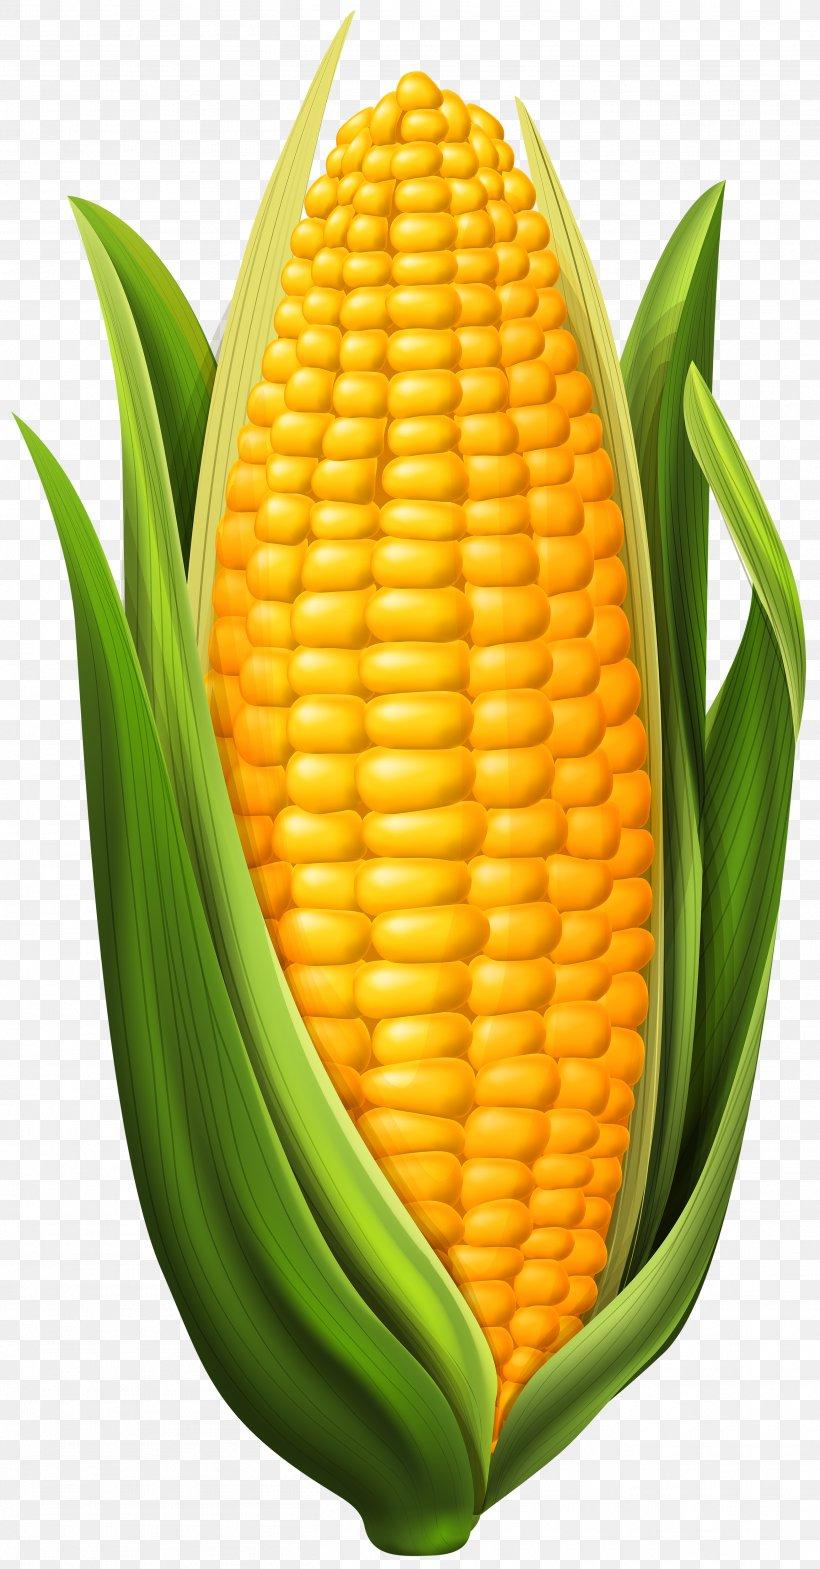 Candy Corn Corn Dog Corn On The Cob Maize Clip Art, PNG.